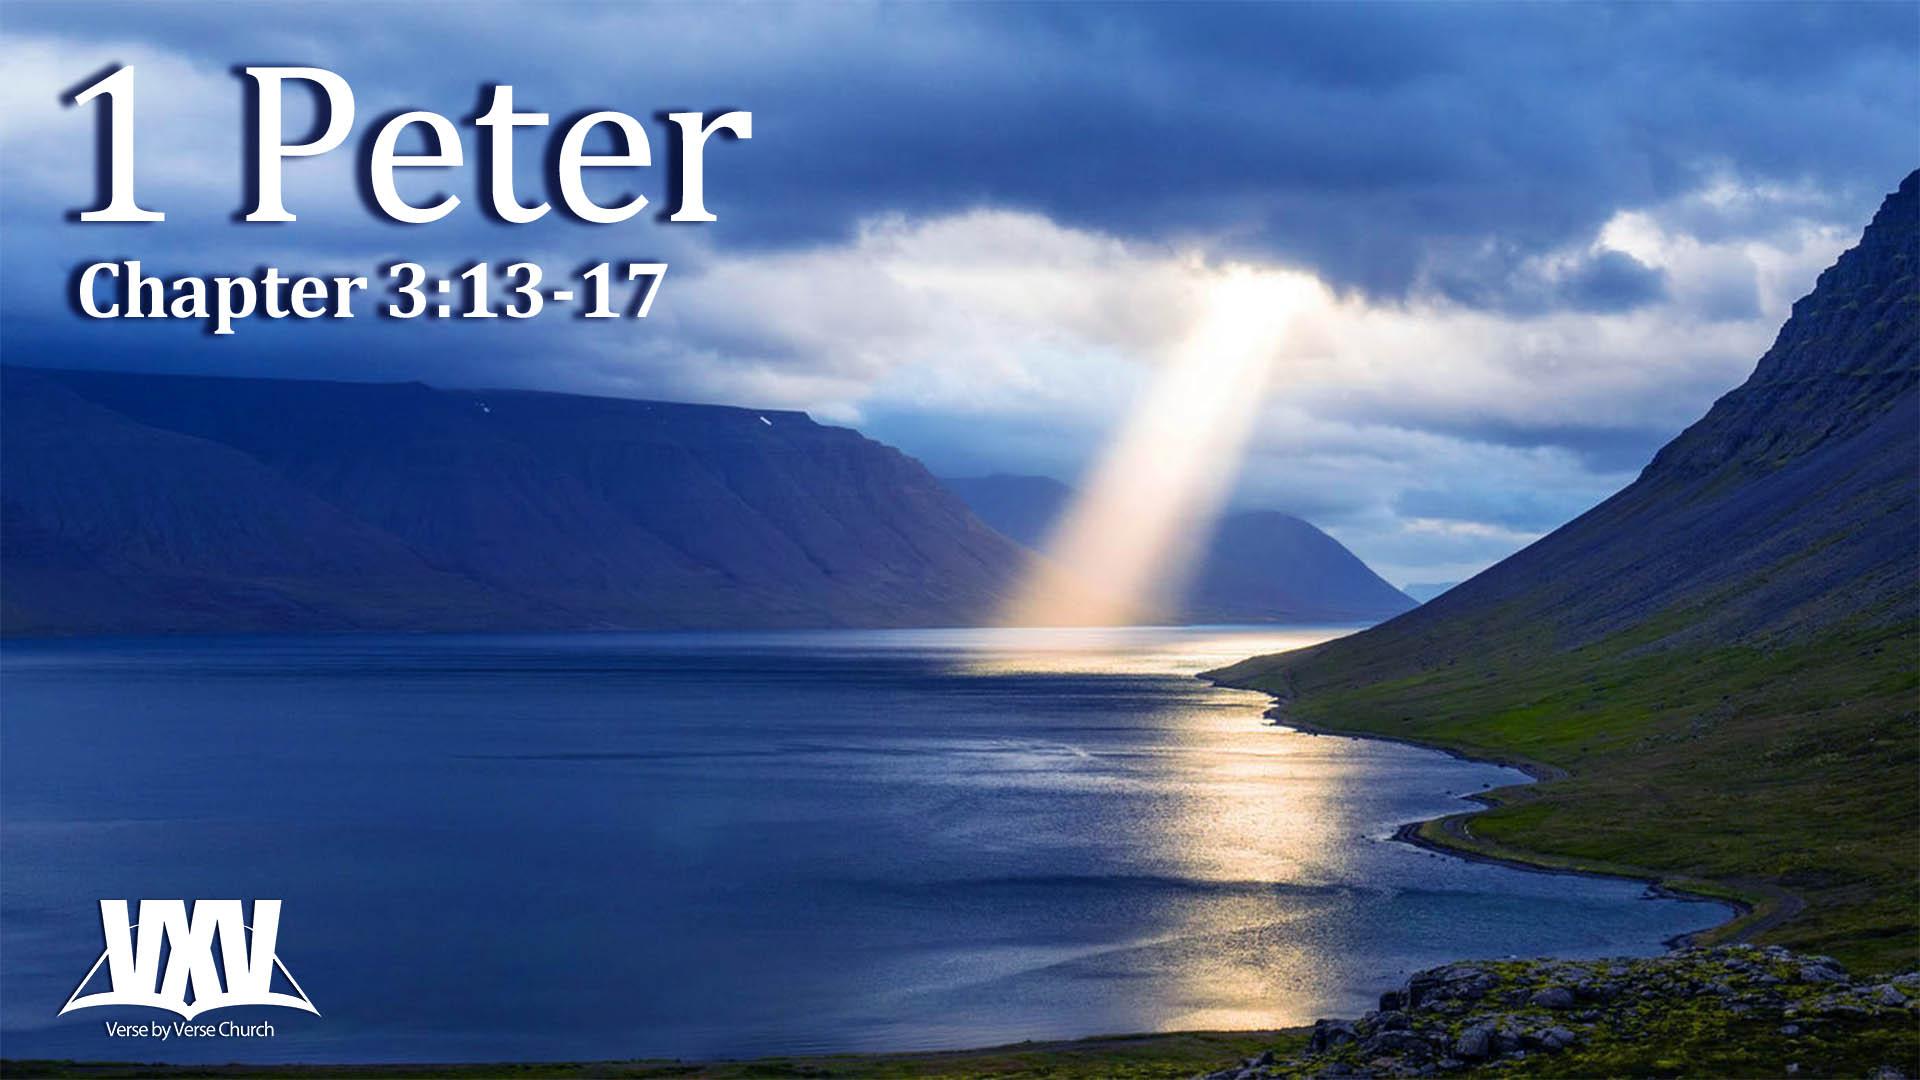 1 Peter 3:13-17 - Verse by Verse